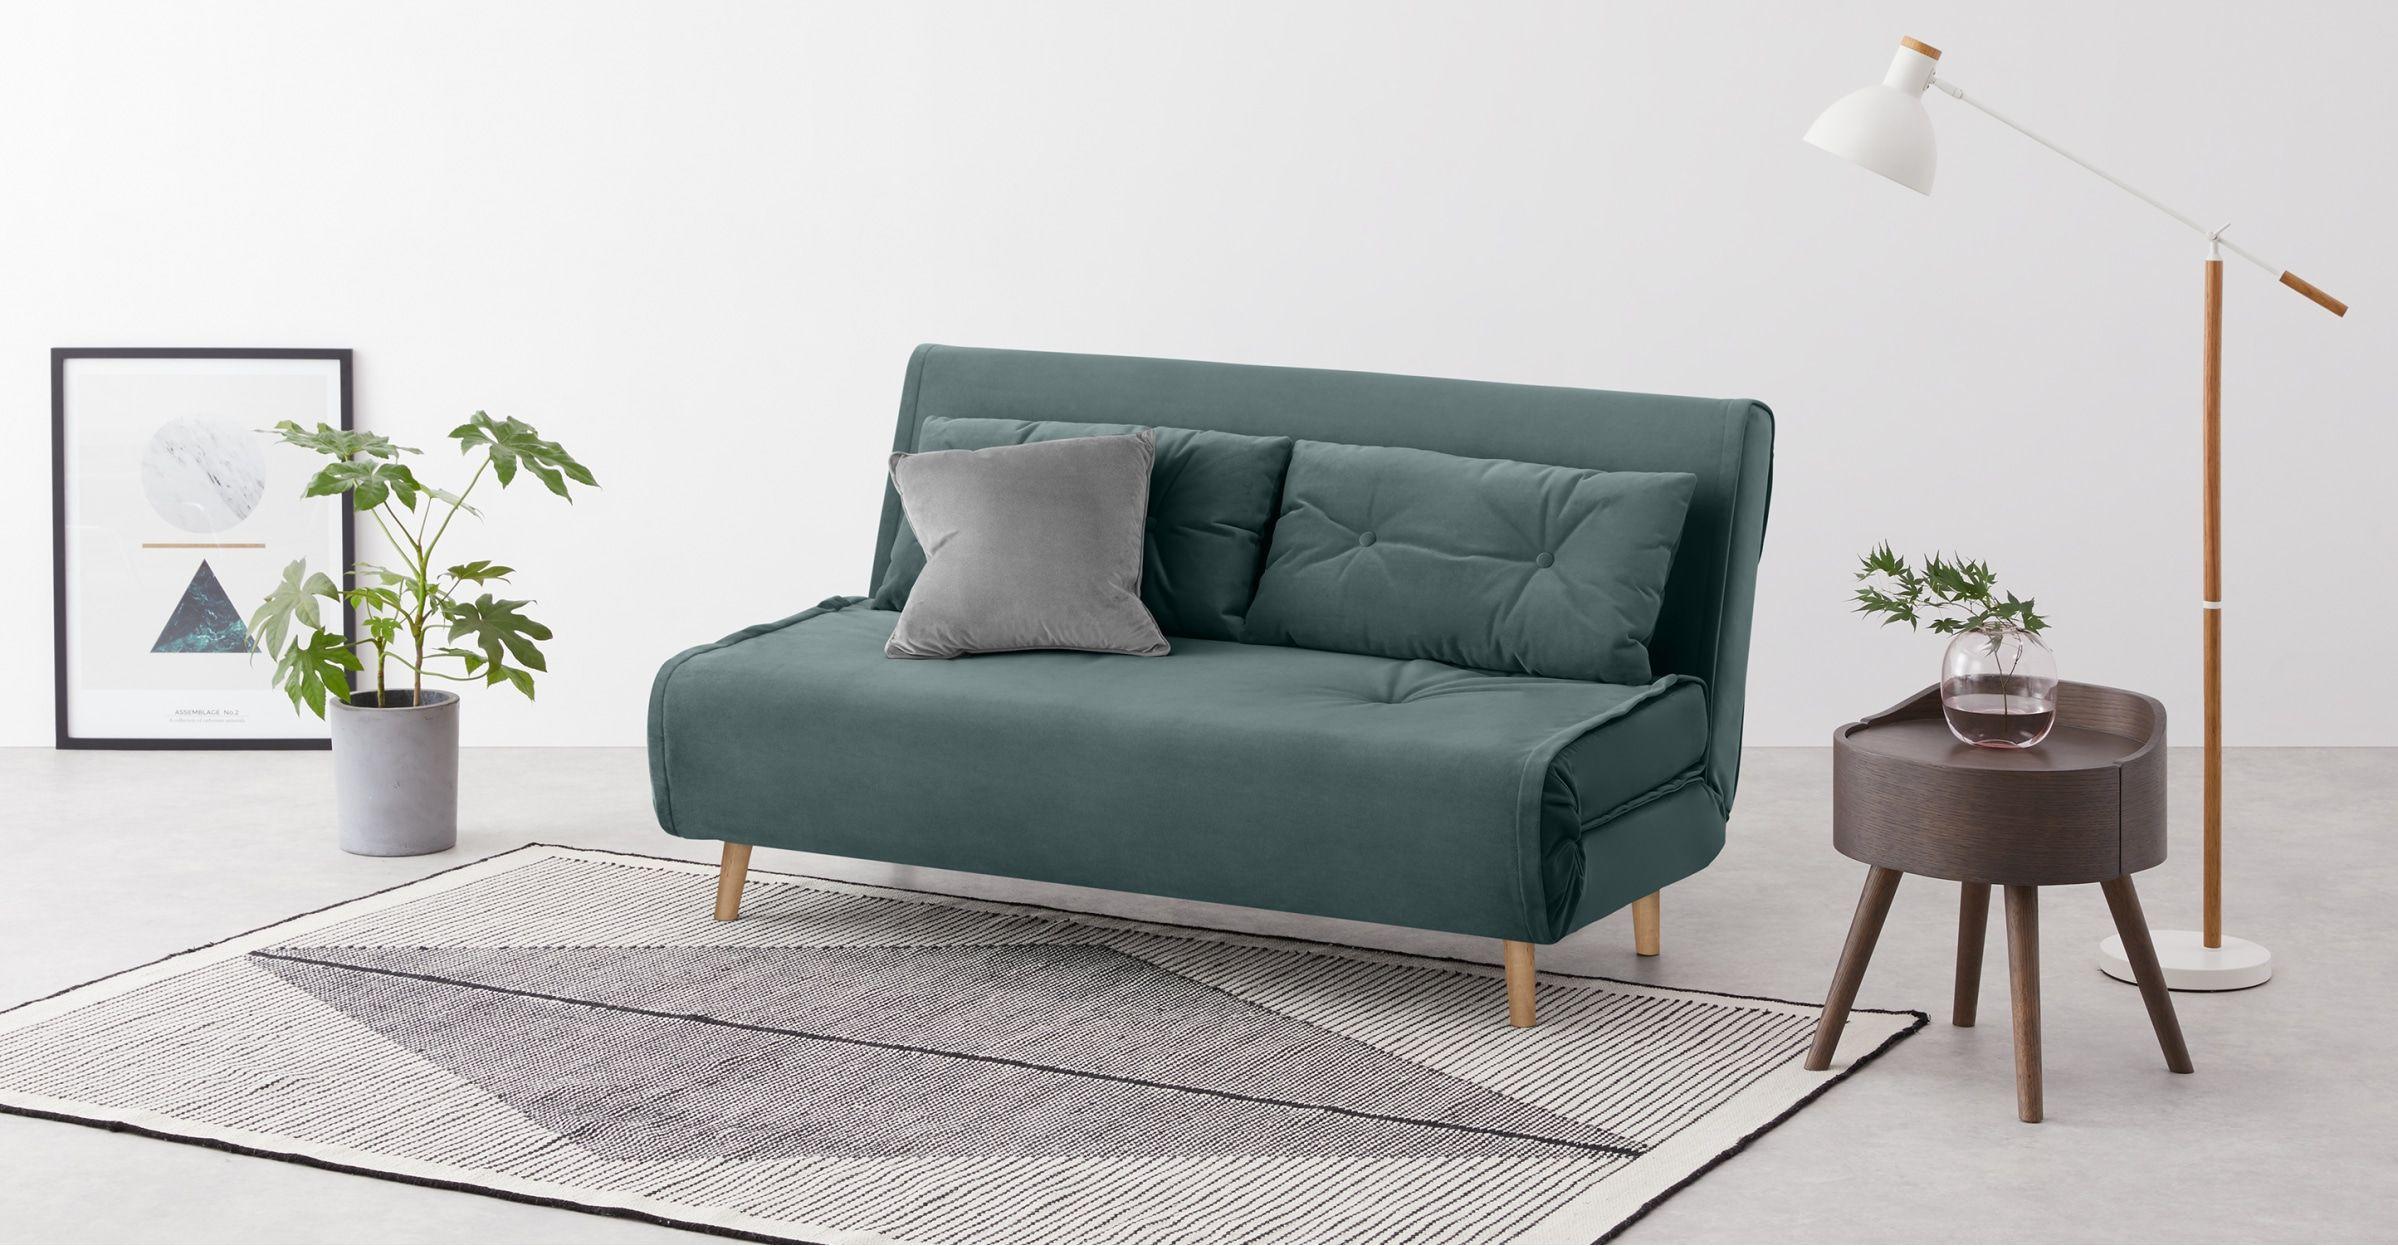 Haru Large Double Sofa Bed Marine Green Velvet In 2020 Sofa Bed Velvet Sofa Bed Foam Sofa Bed